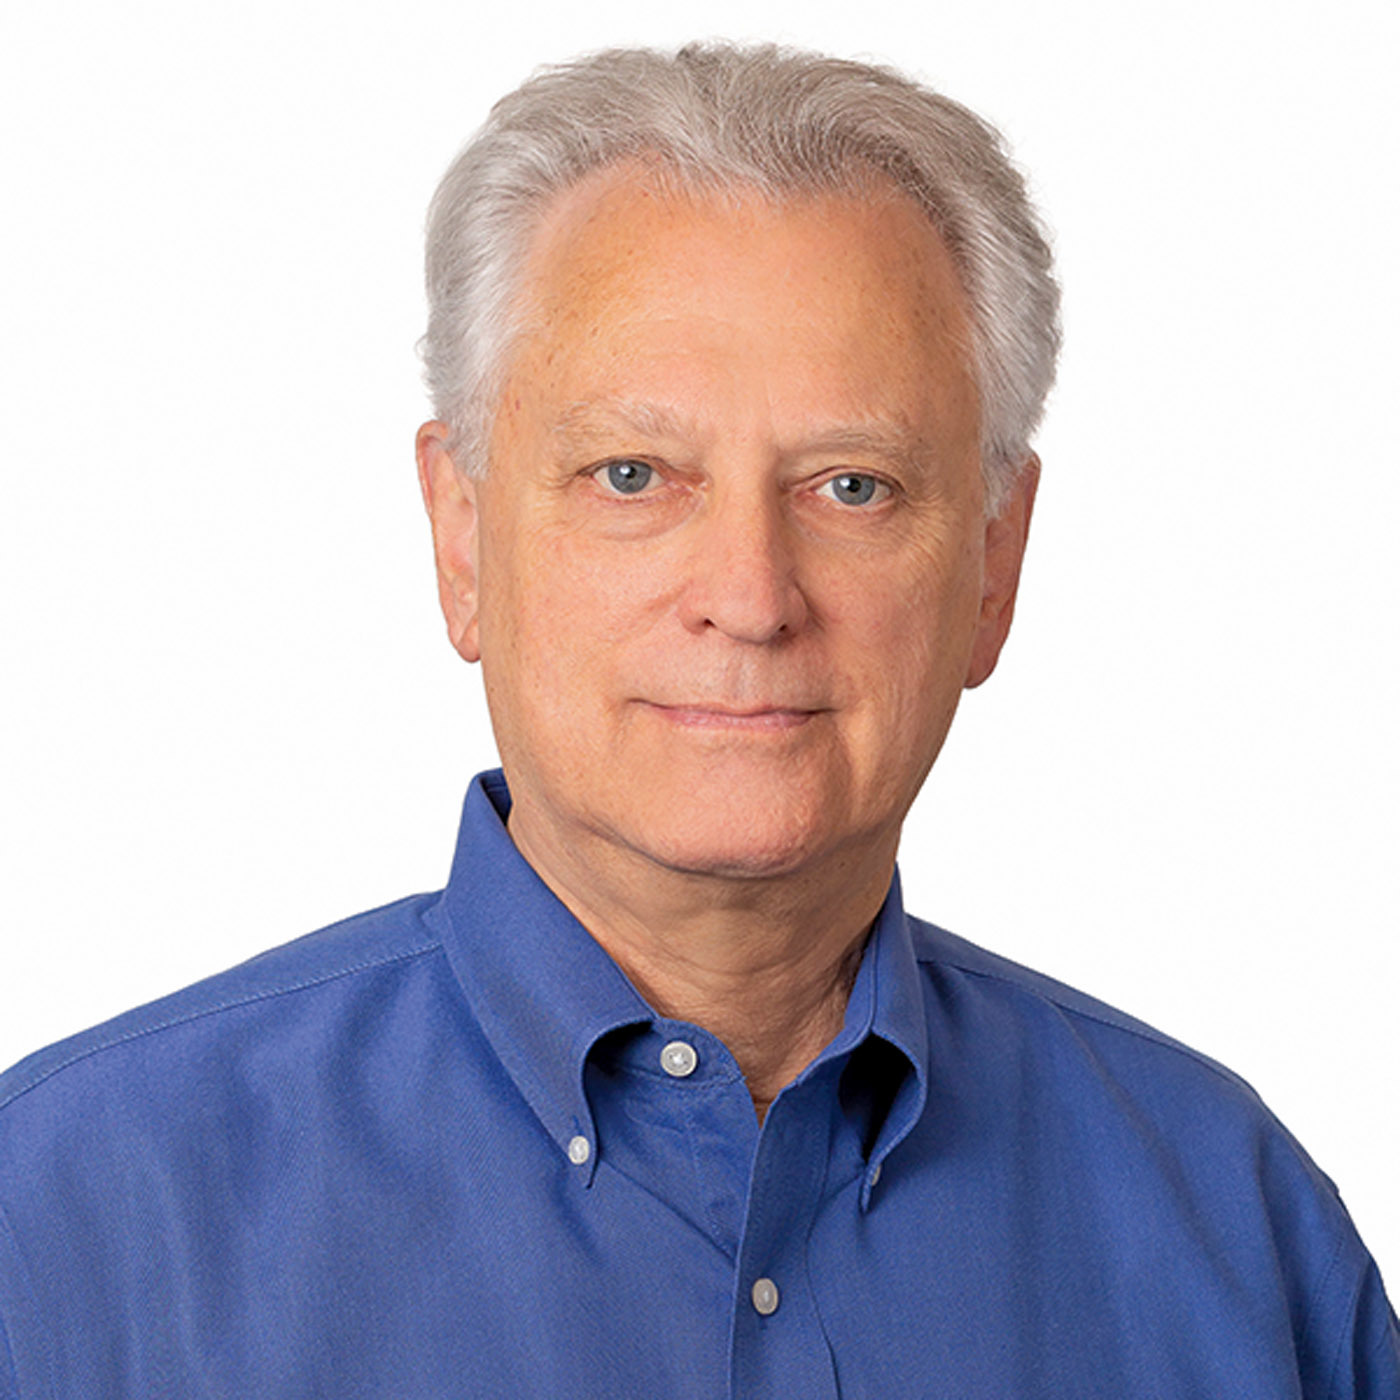 Alan Odgers